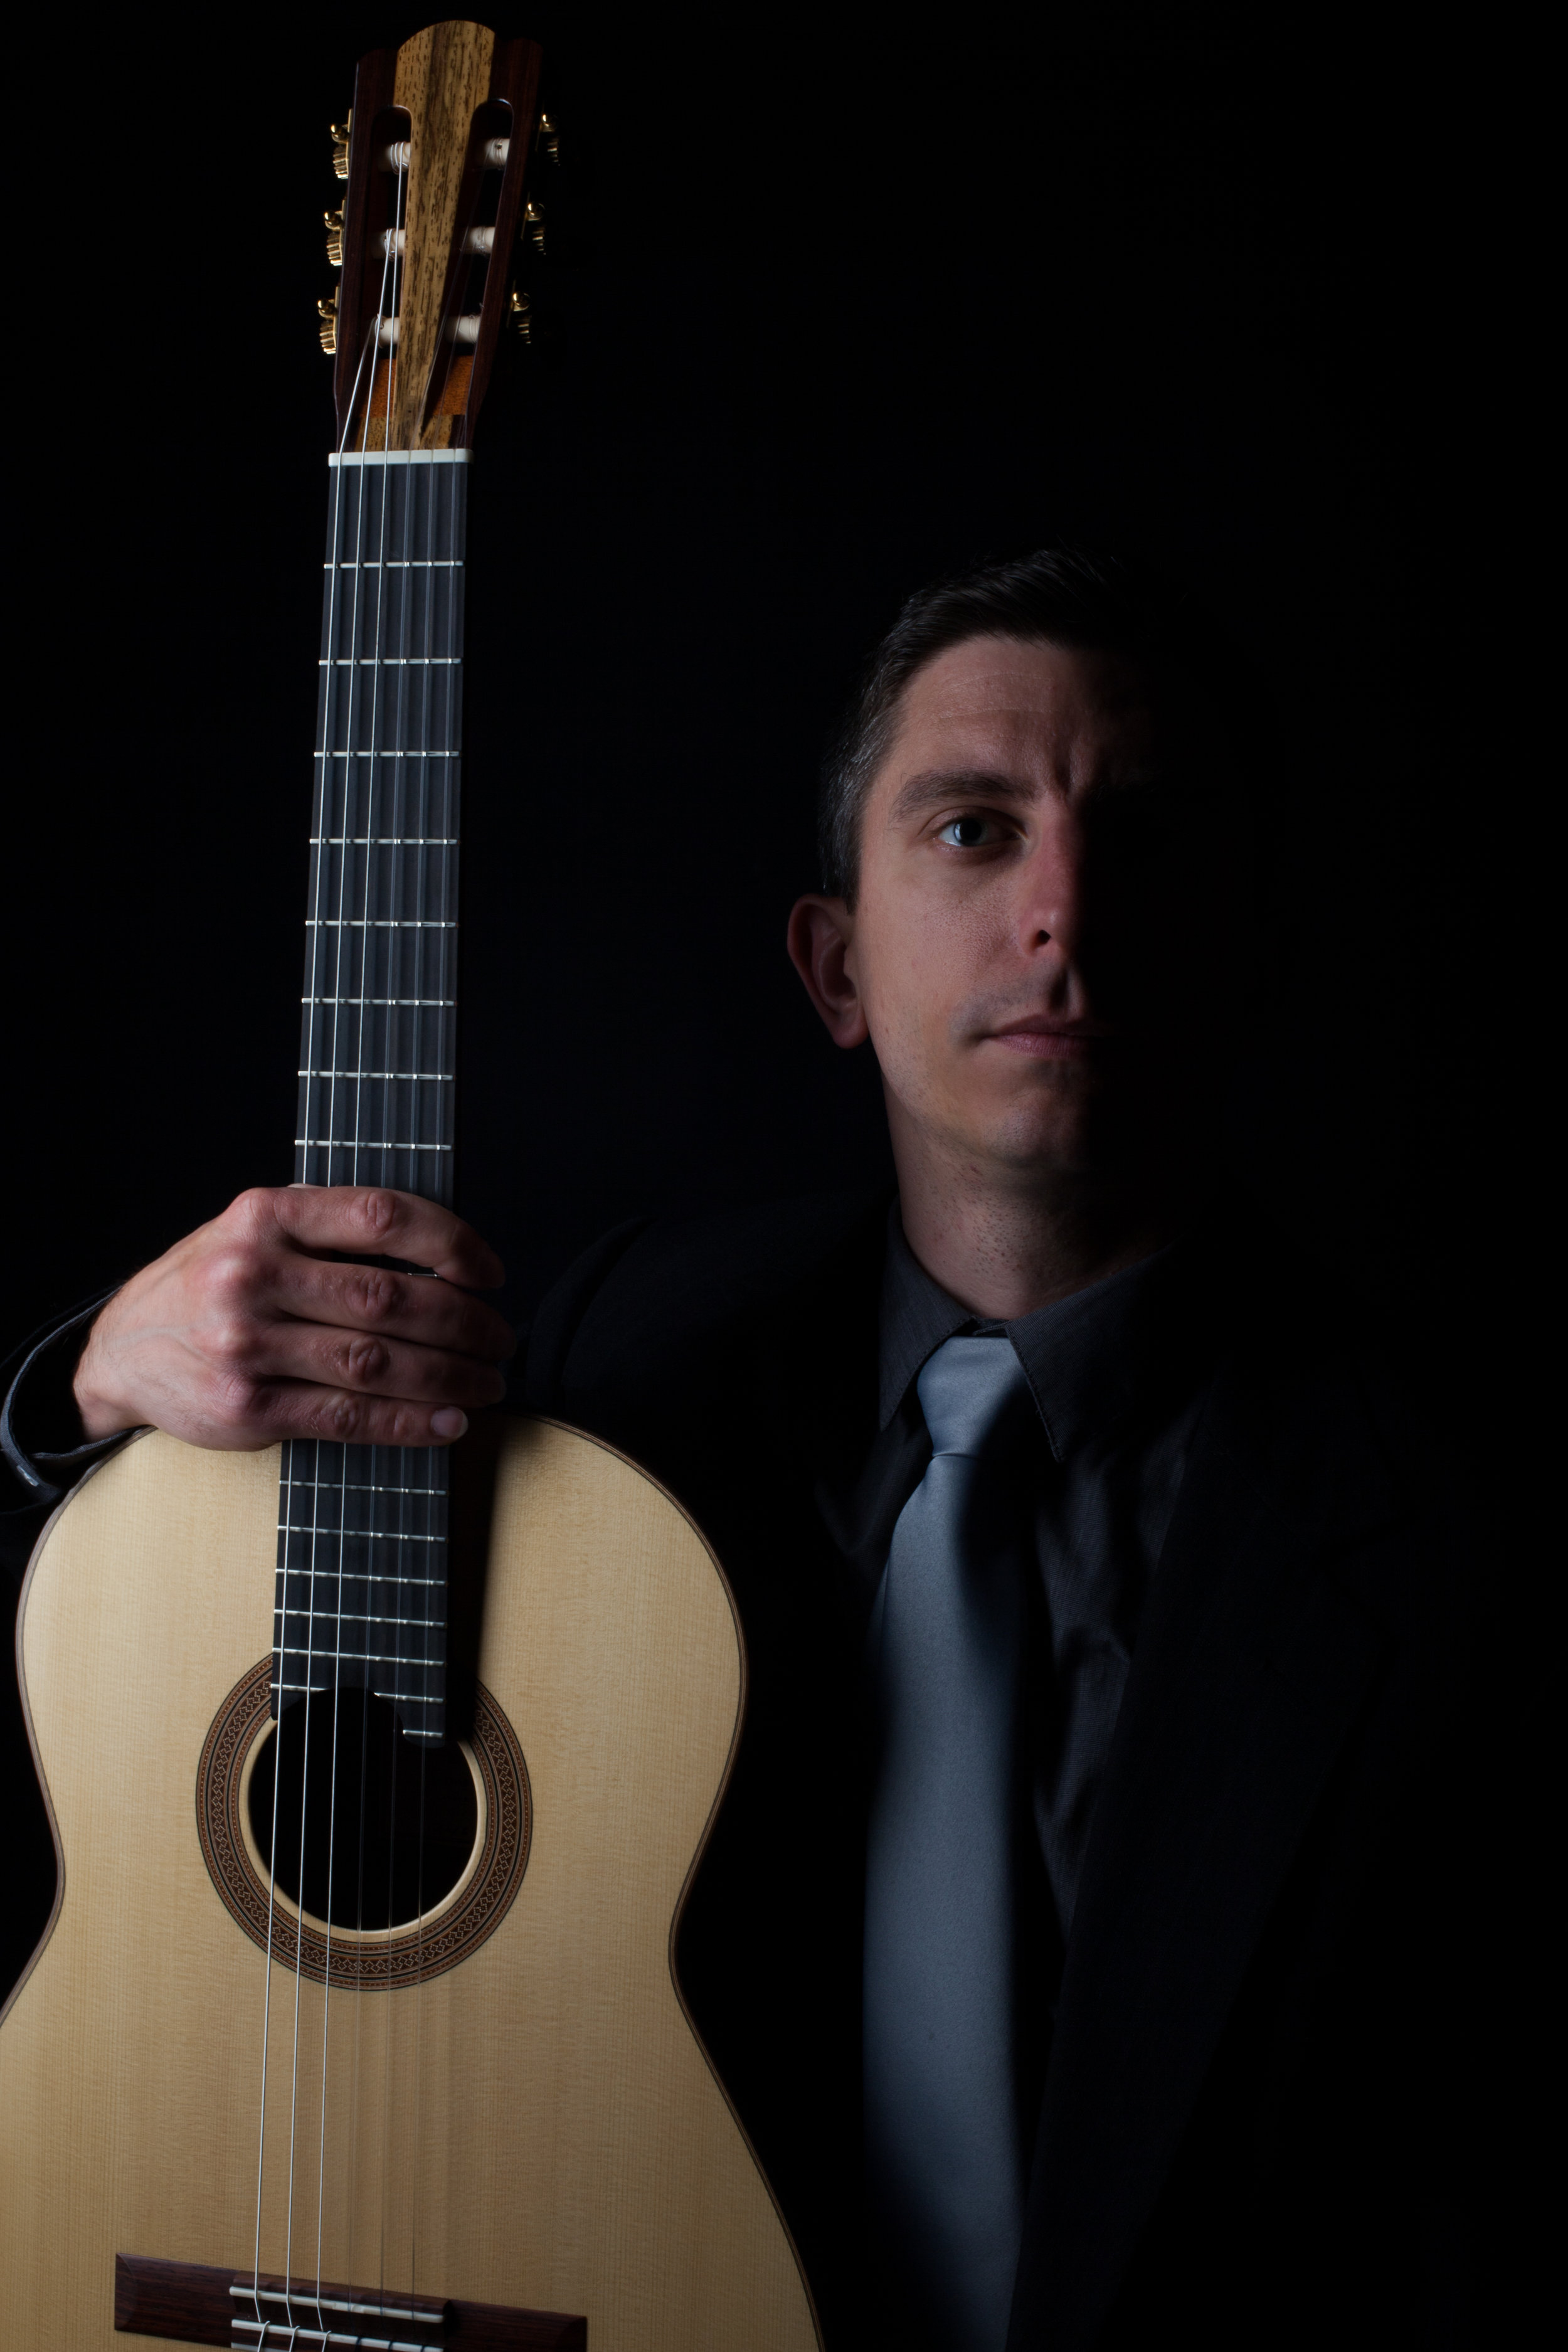 Kevin-J-Cope-Holding-Douglass-Scott-Guitar-credit-Brian-Mengini (2).jpg